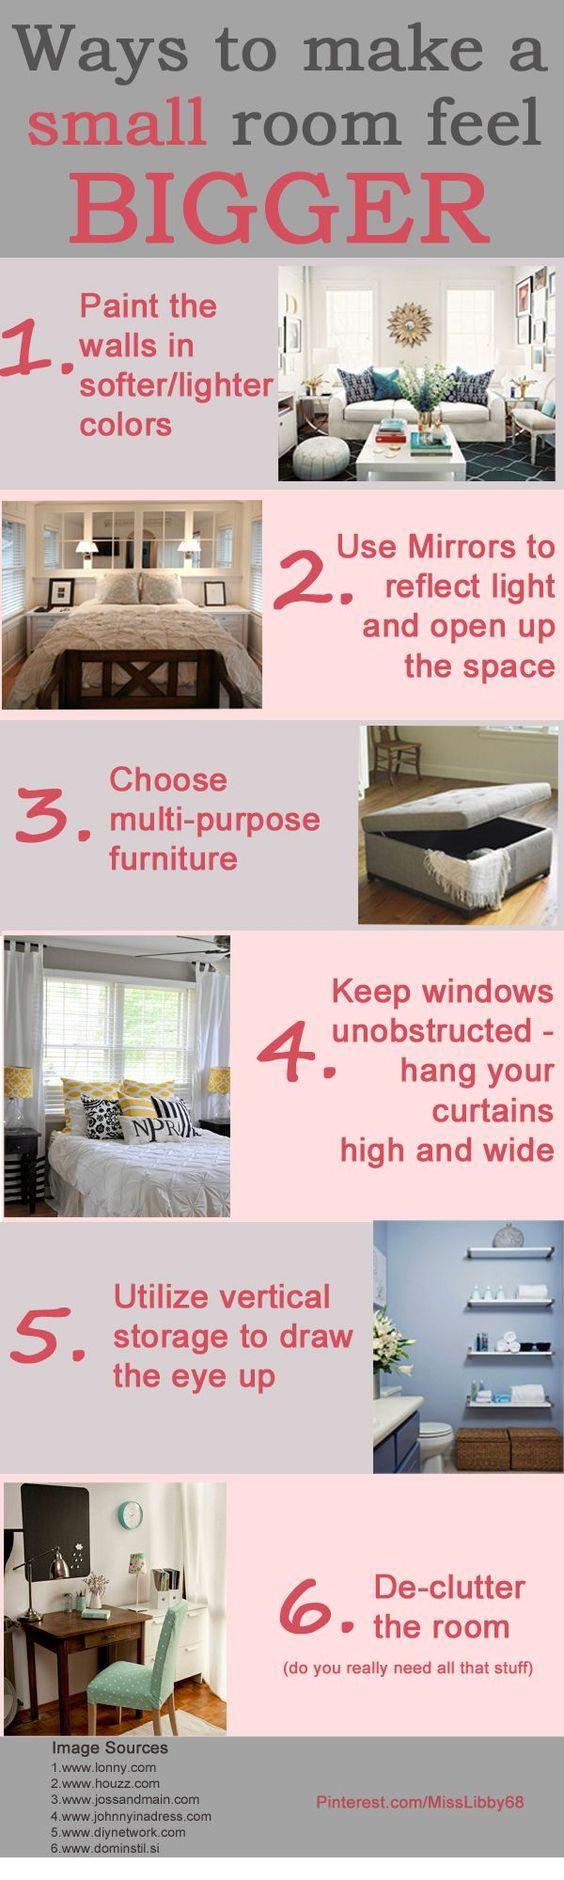 bedroom organization tips bedroom organization and small